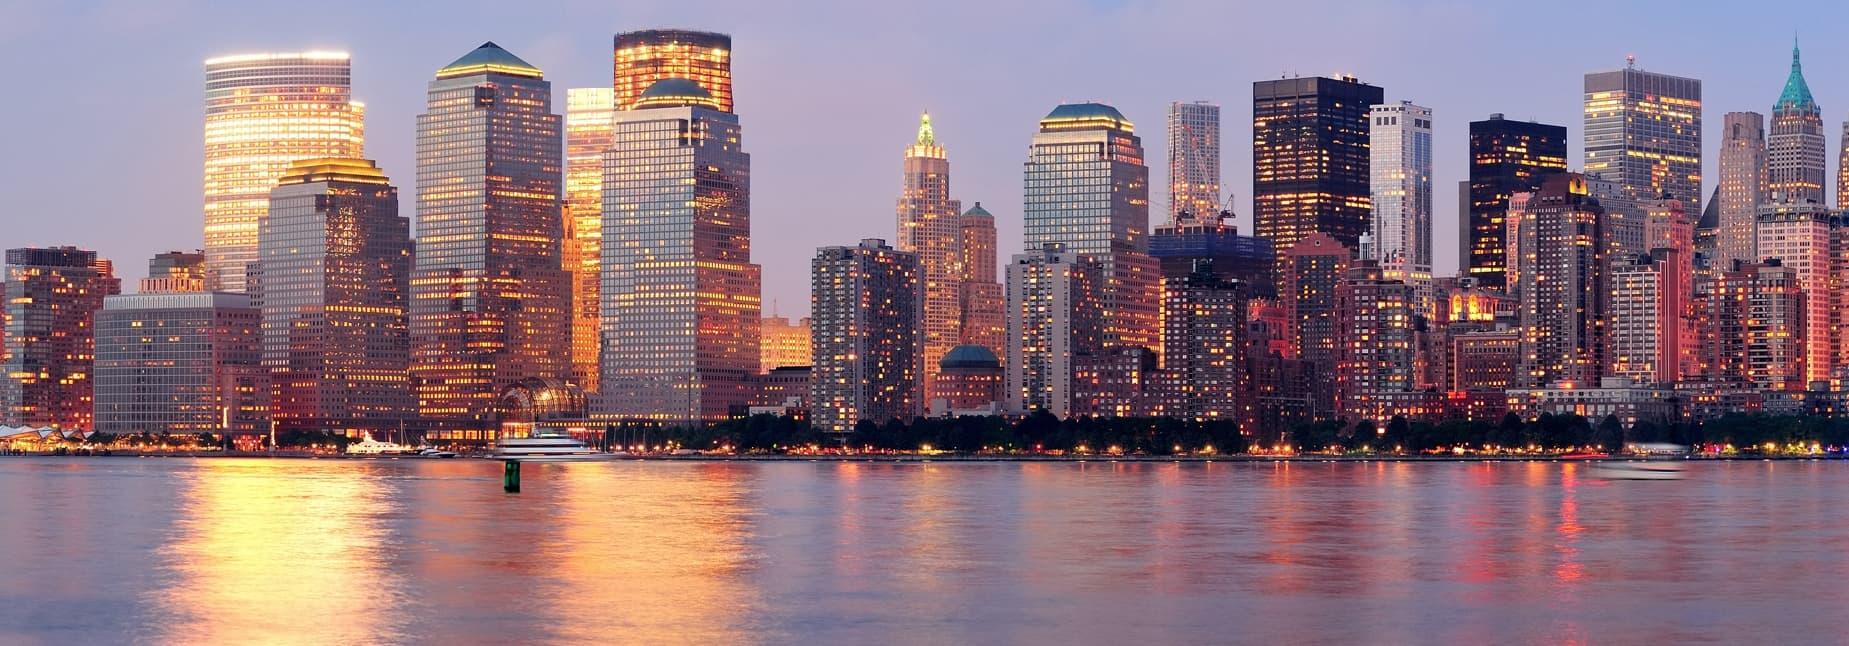 Nova Iorque:  4 noites + voos, desde 668€